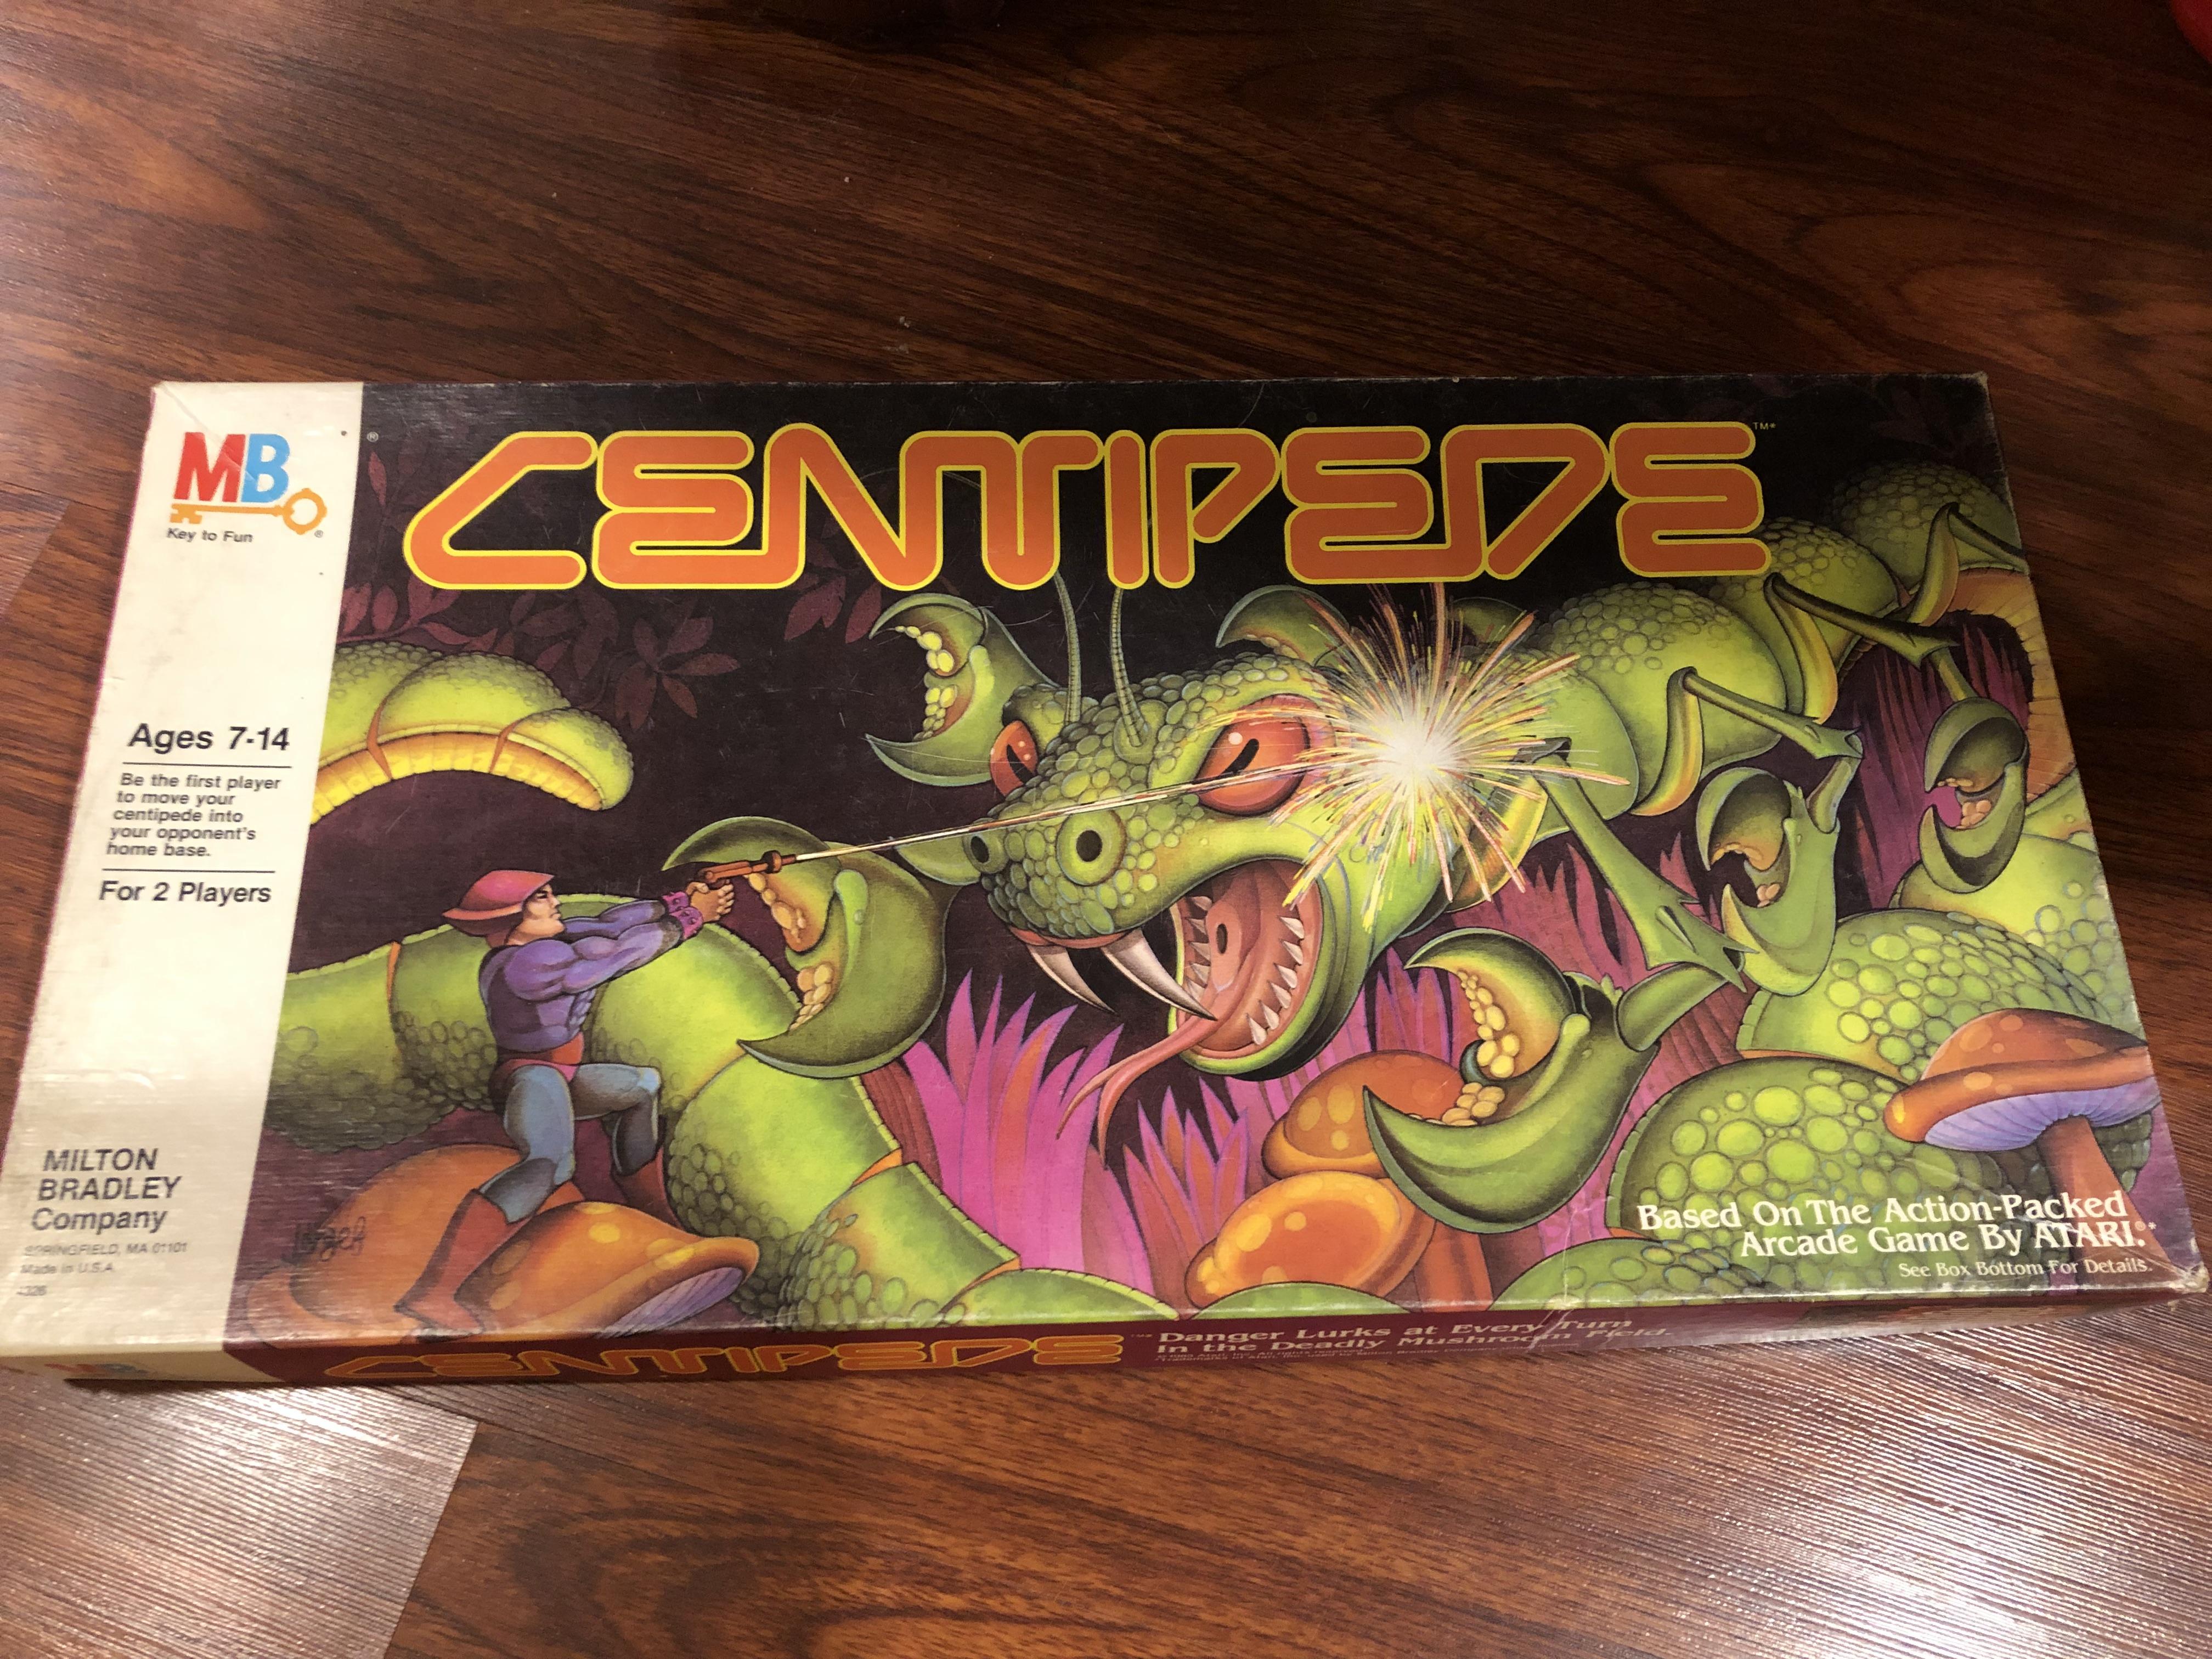 Feeling Board The Centipede Board Game Stone Age Gamer